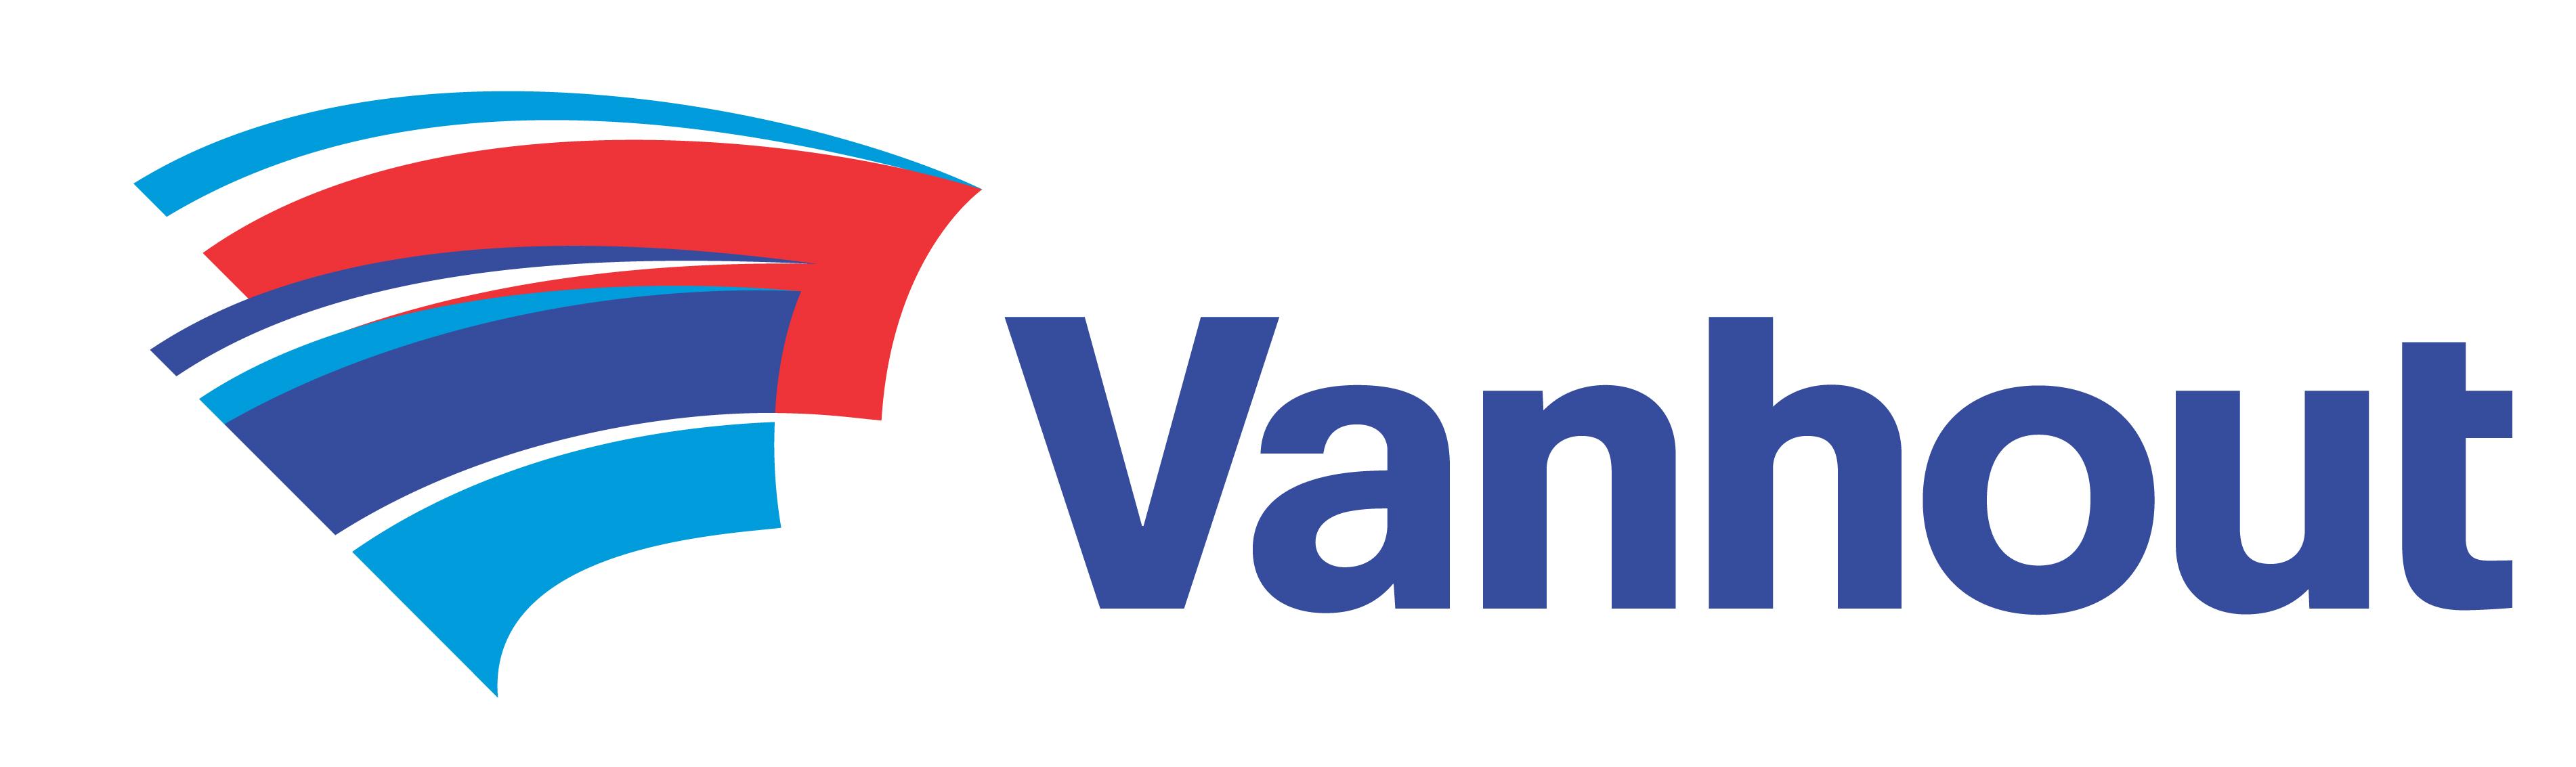 Logo Vanhout